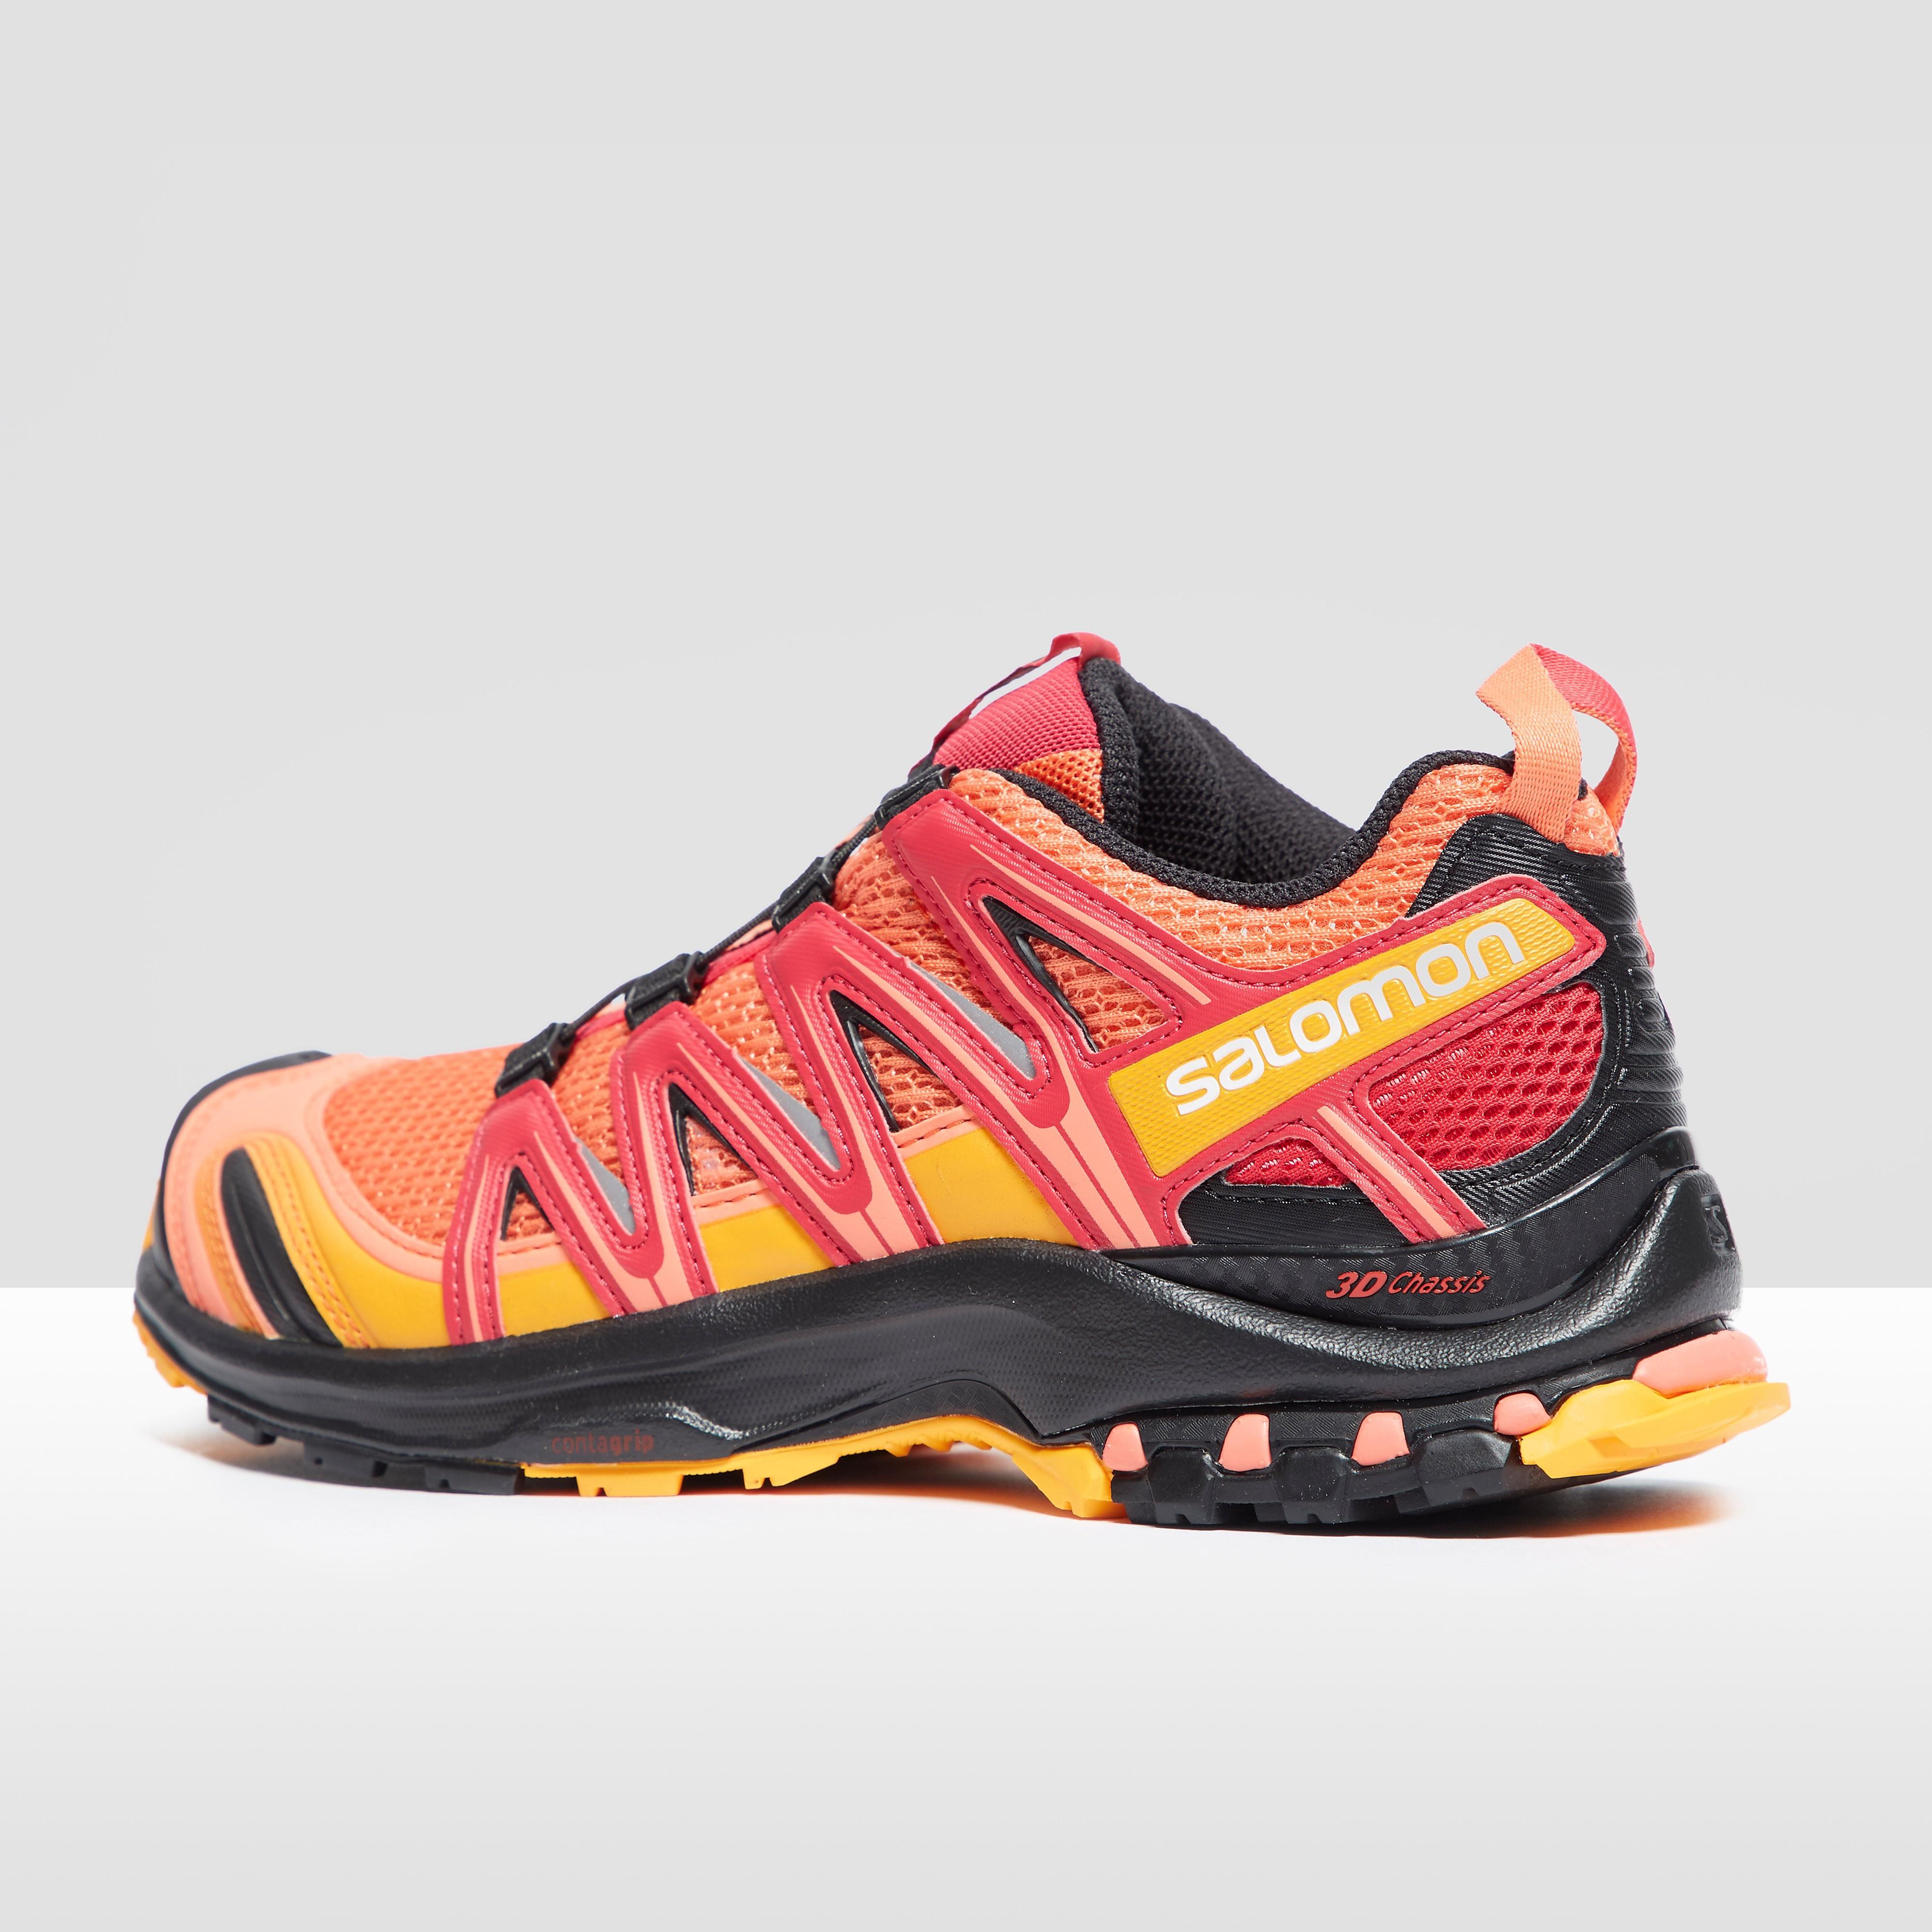 Salomon XA PRO 3D GTX Trail Women's Running Shoes